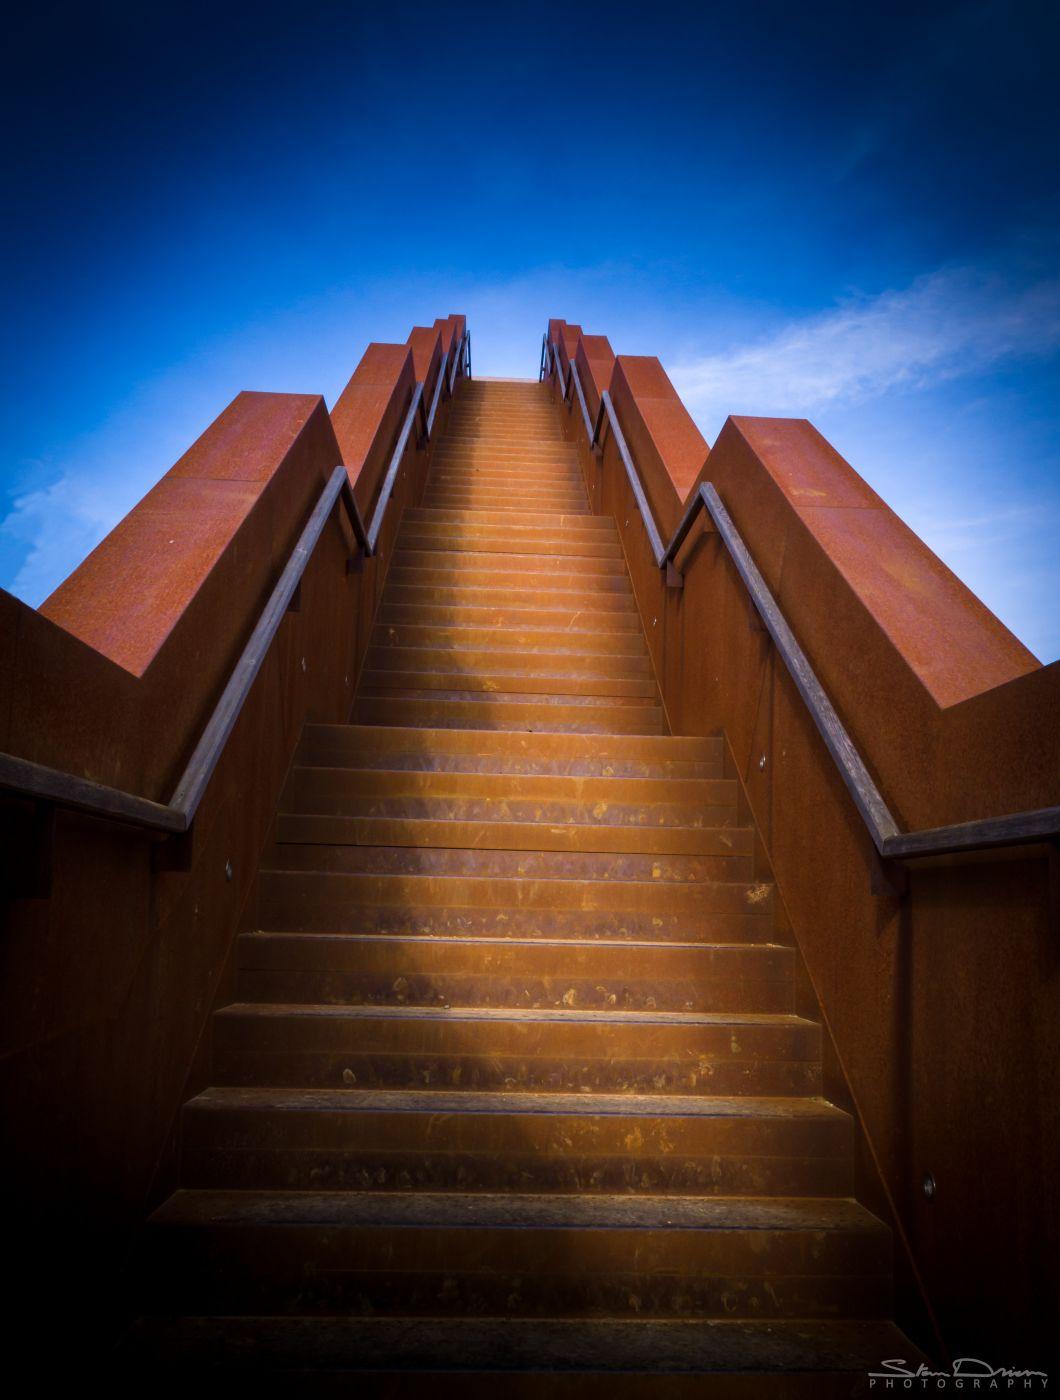 Stair to ..., Belgium